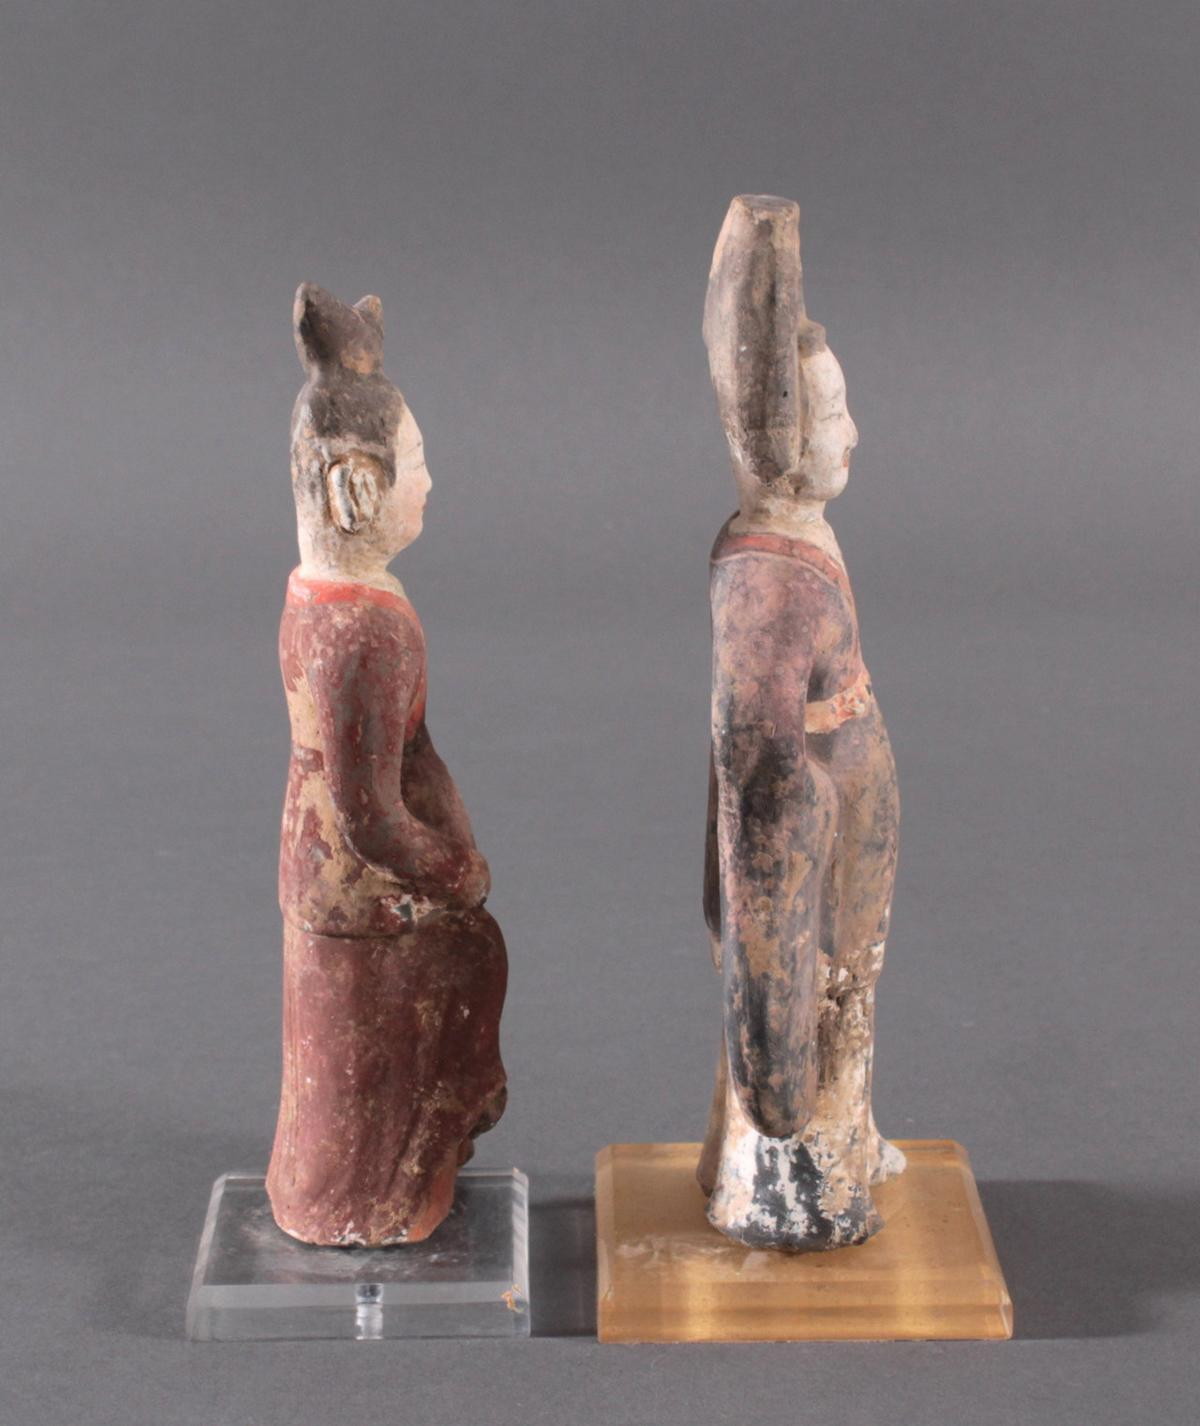 China TANG-Dynastie, 2 Figuren aus Ton-3